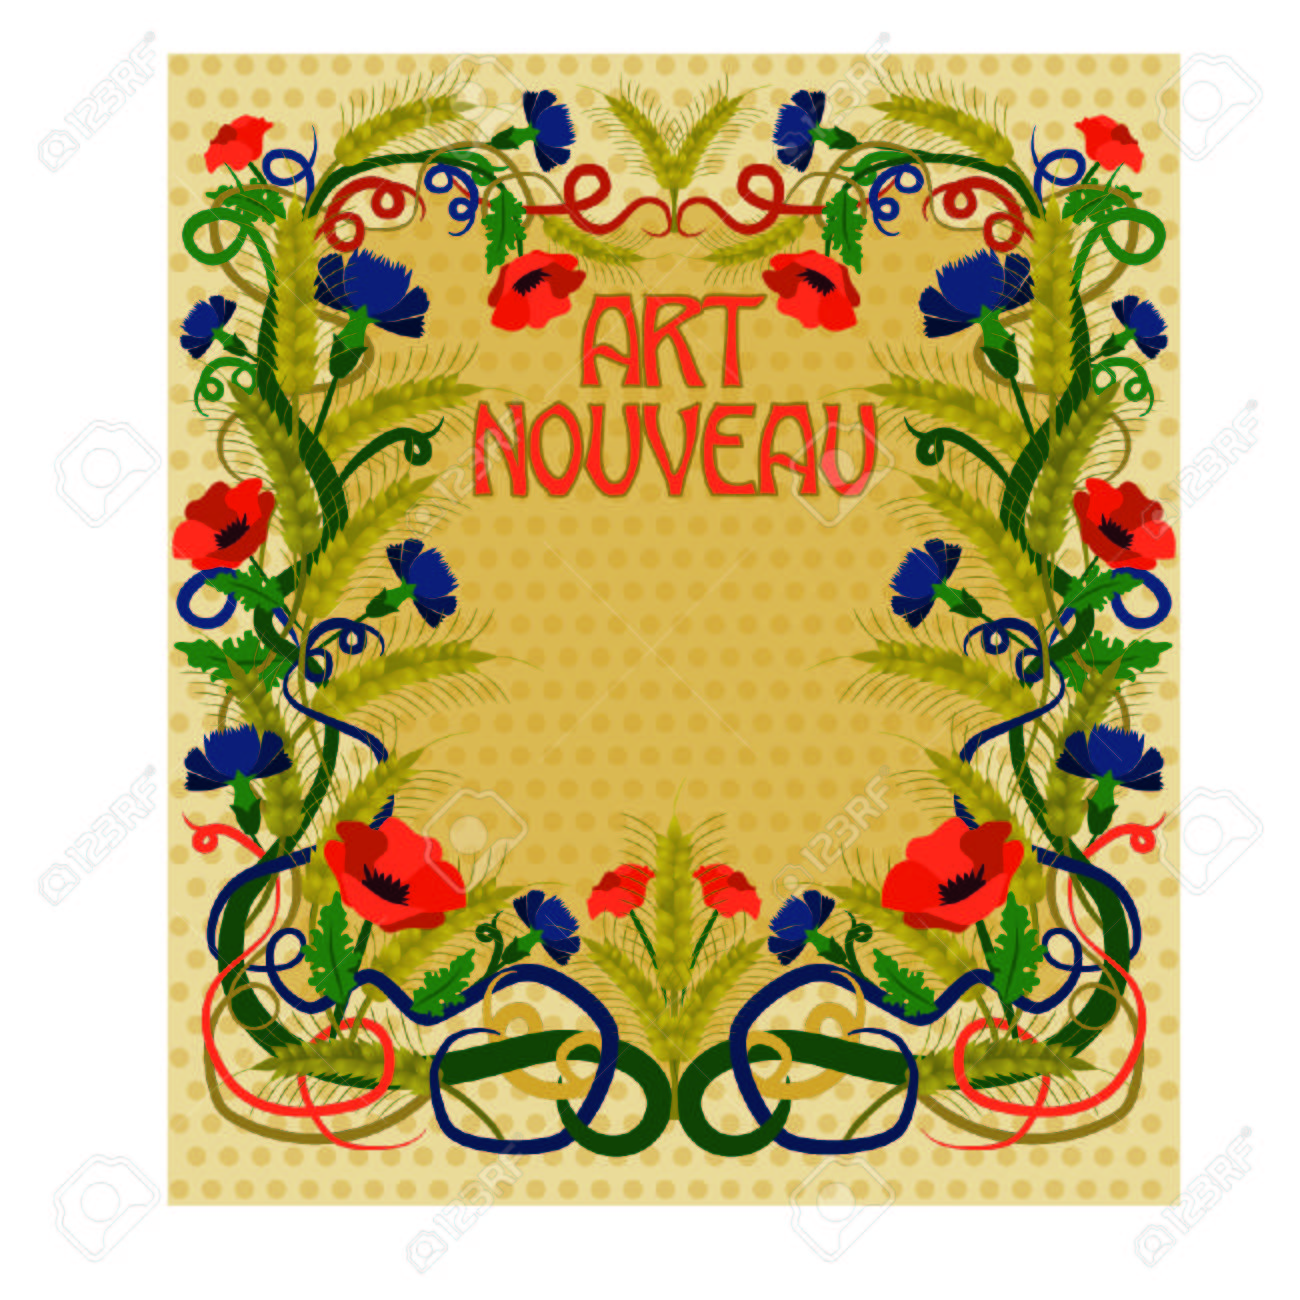 Wheaten Wallpaper In Art Nouveau Style, Vector Illustration Royalty ...